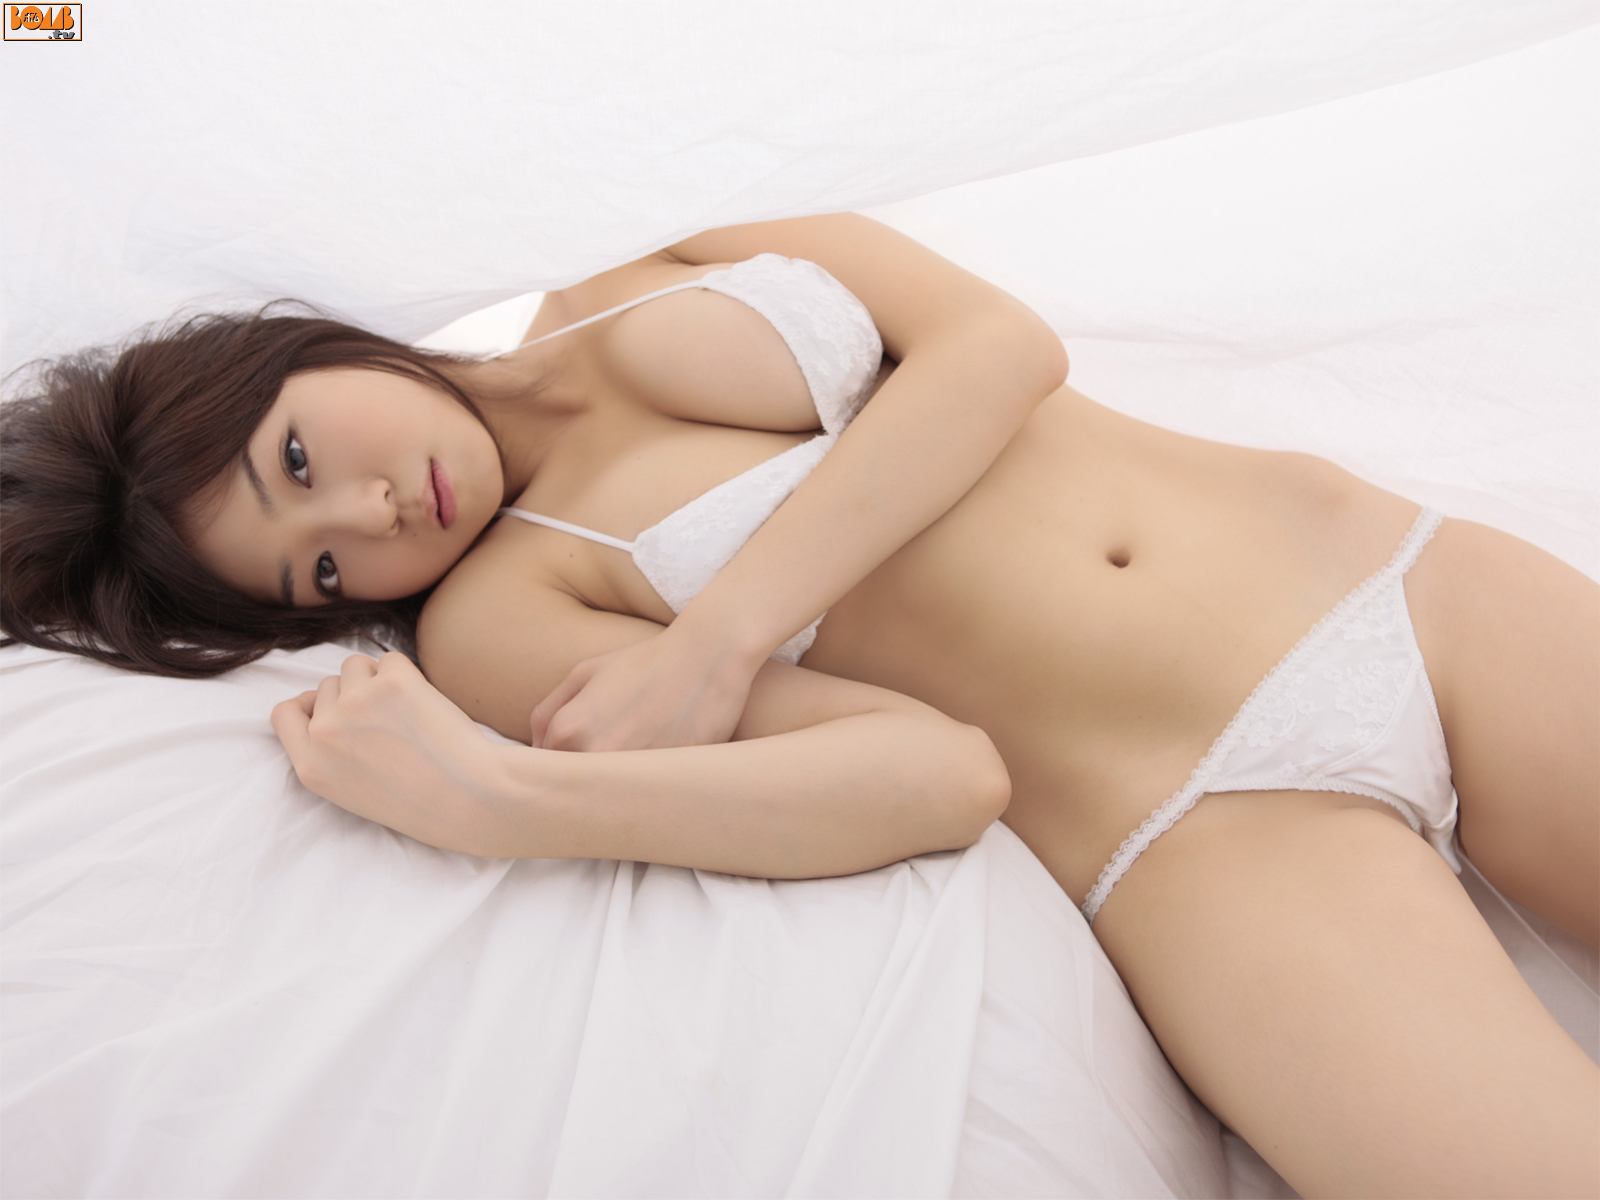 Program To Design A Room Nakamura Shizuka In White Room